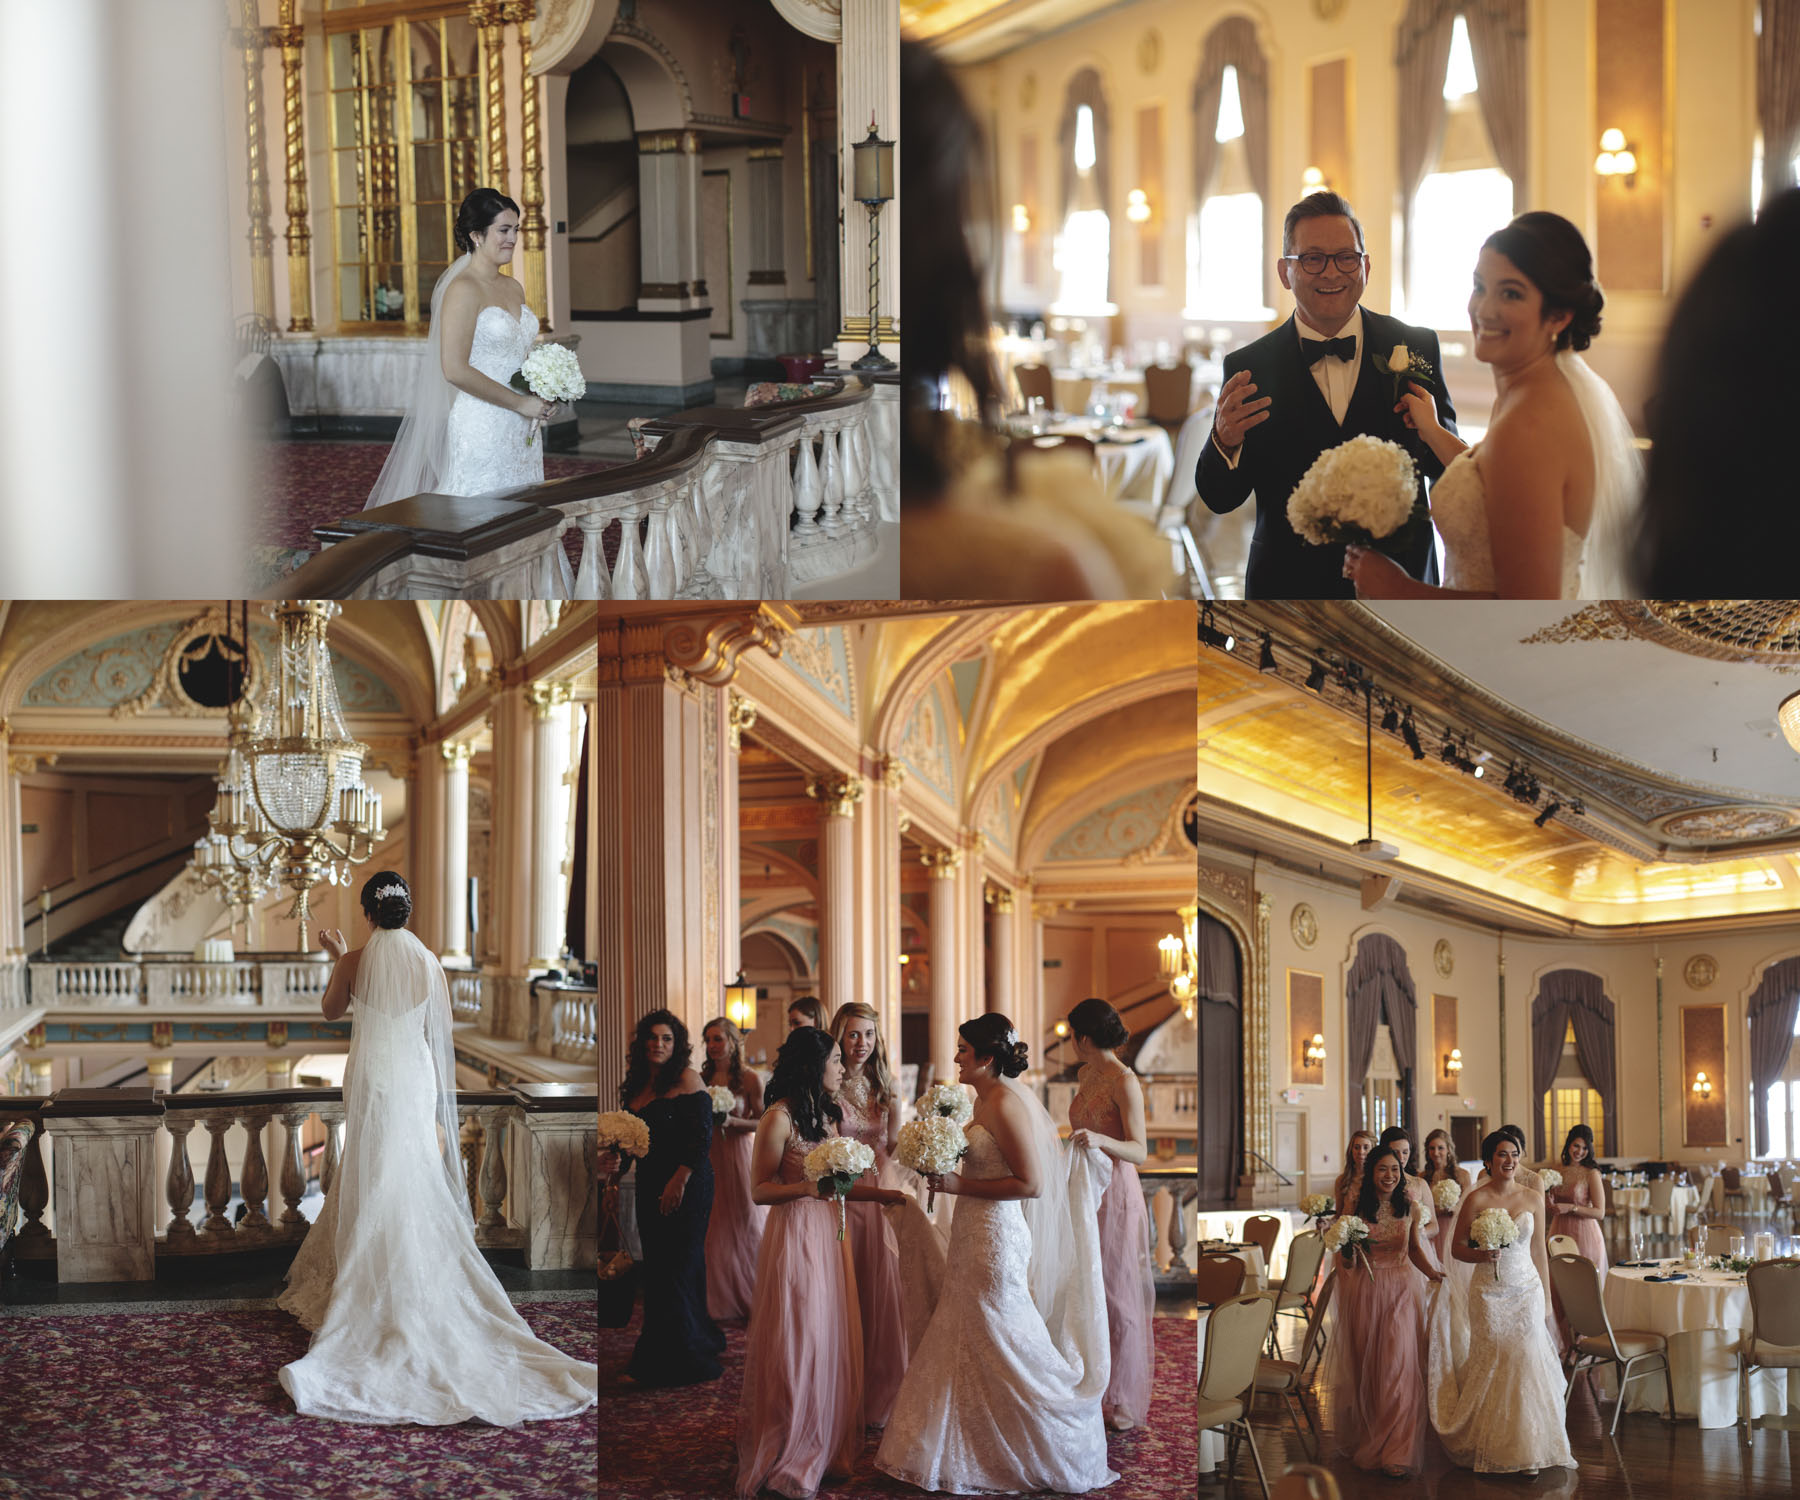 007 jessica lex palais royale wedding.jpg